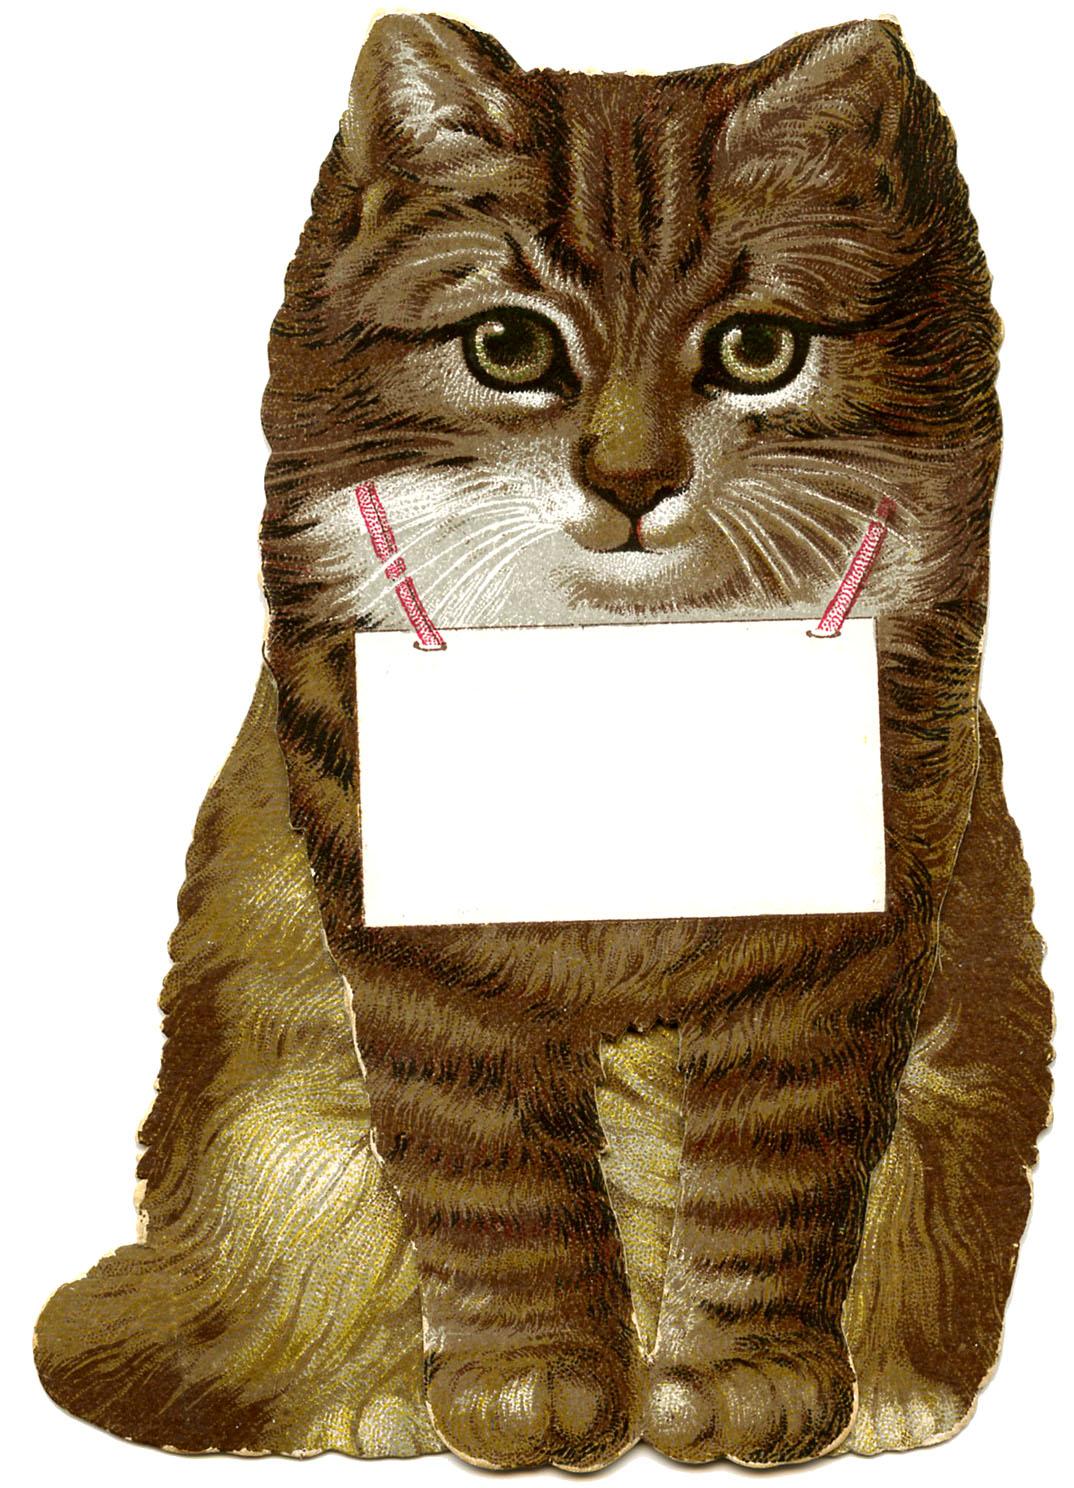 Vintage Clip Art Cutest Cat Image Ever The Graphics Fairy